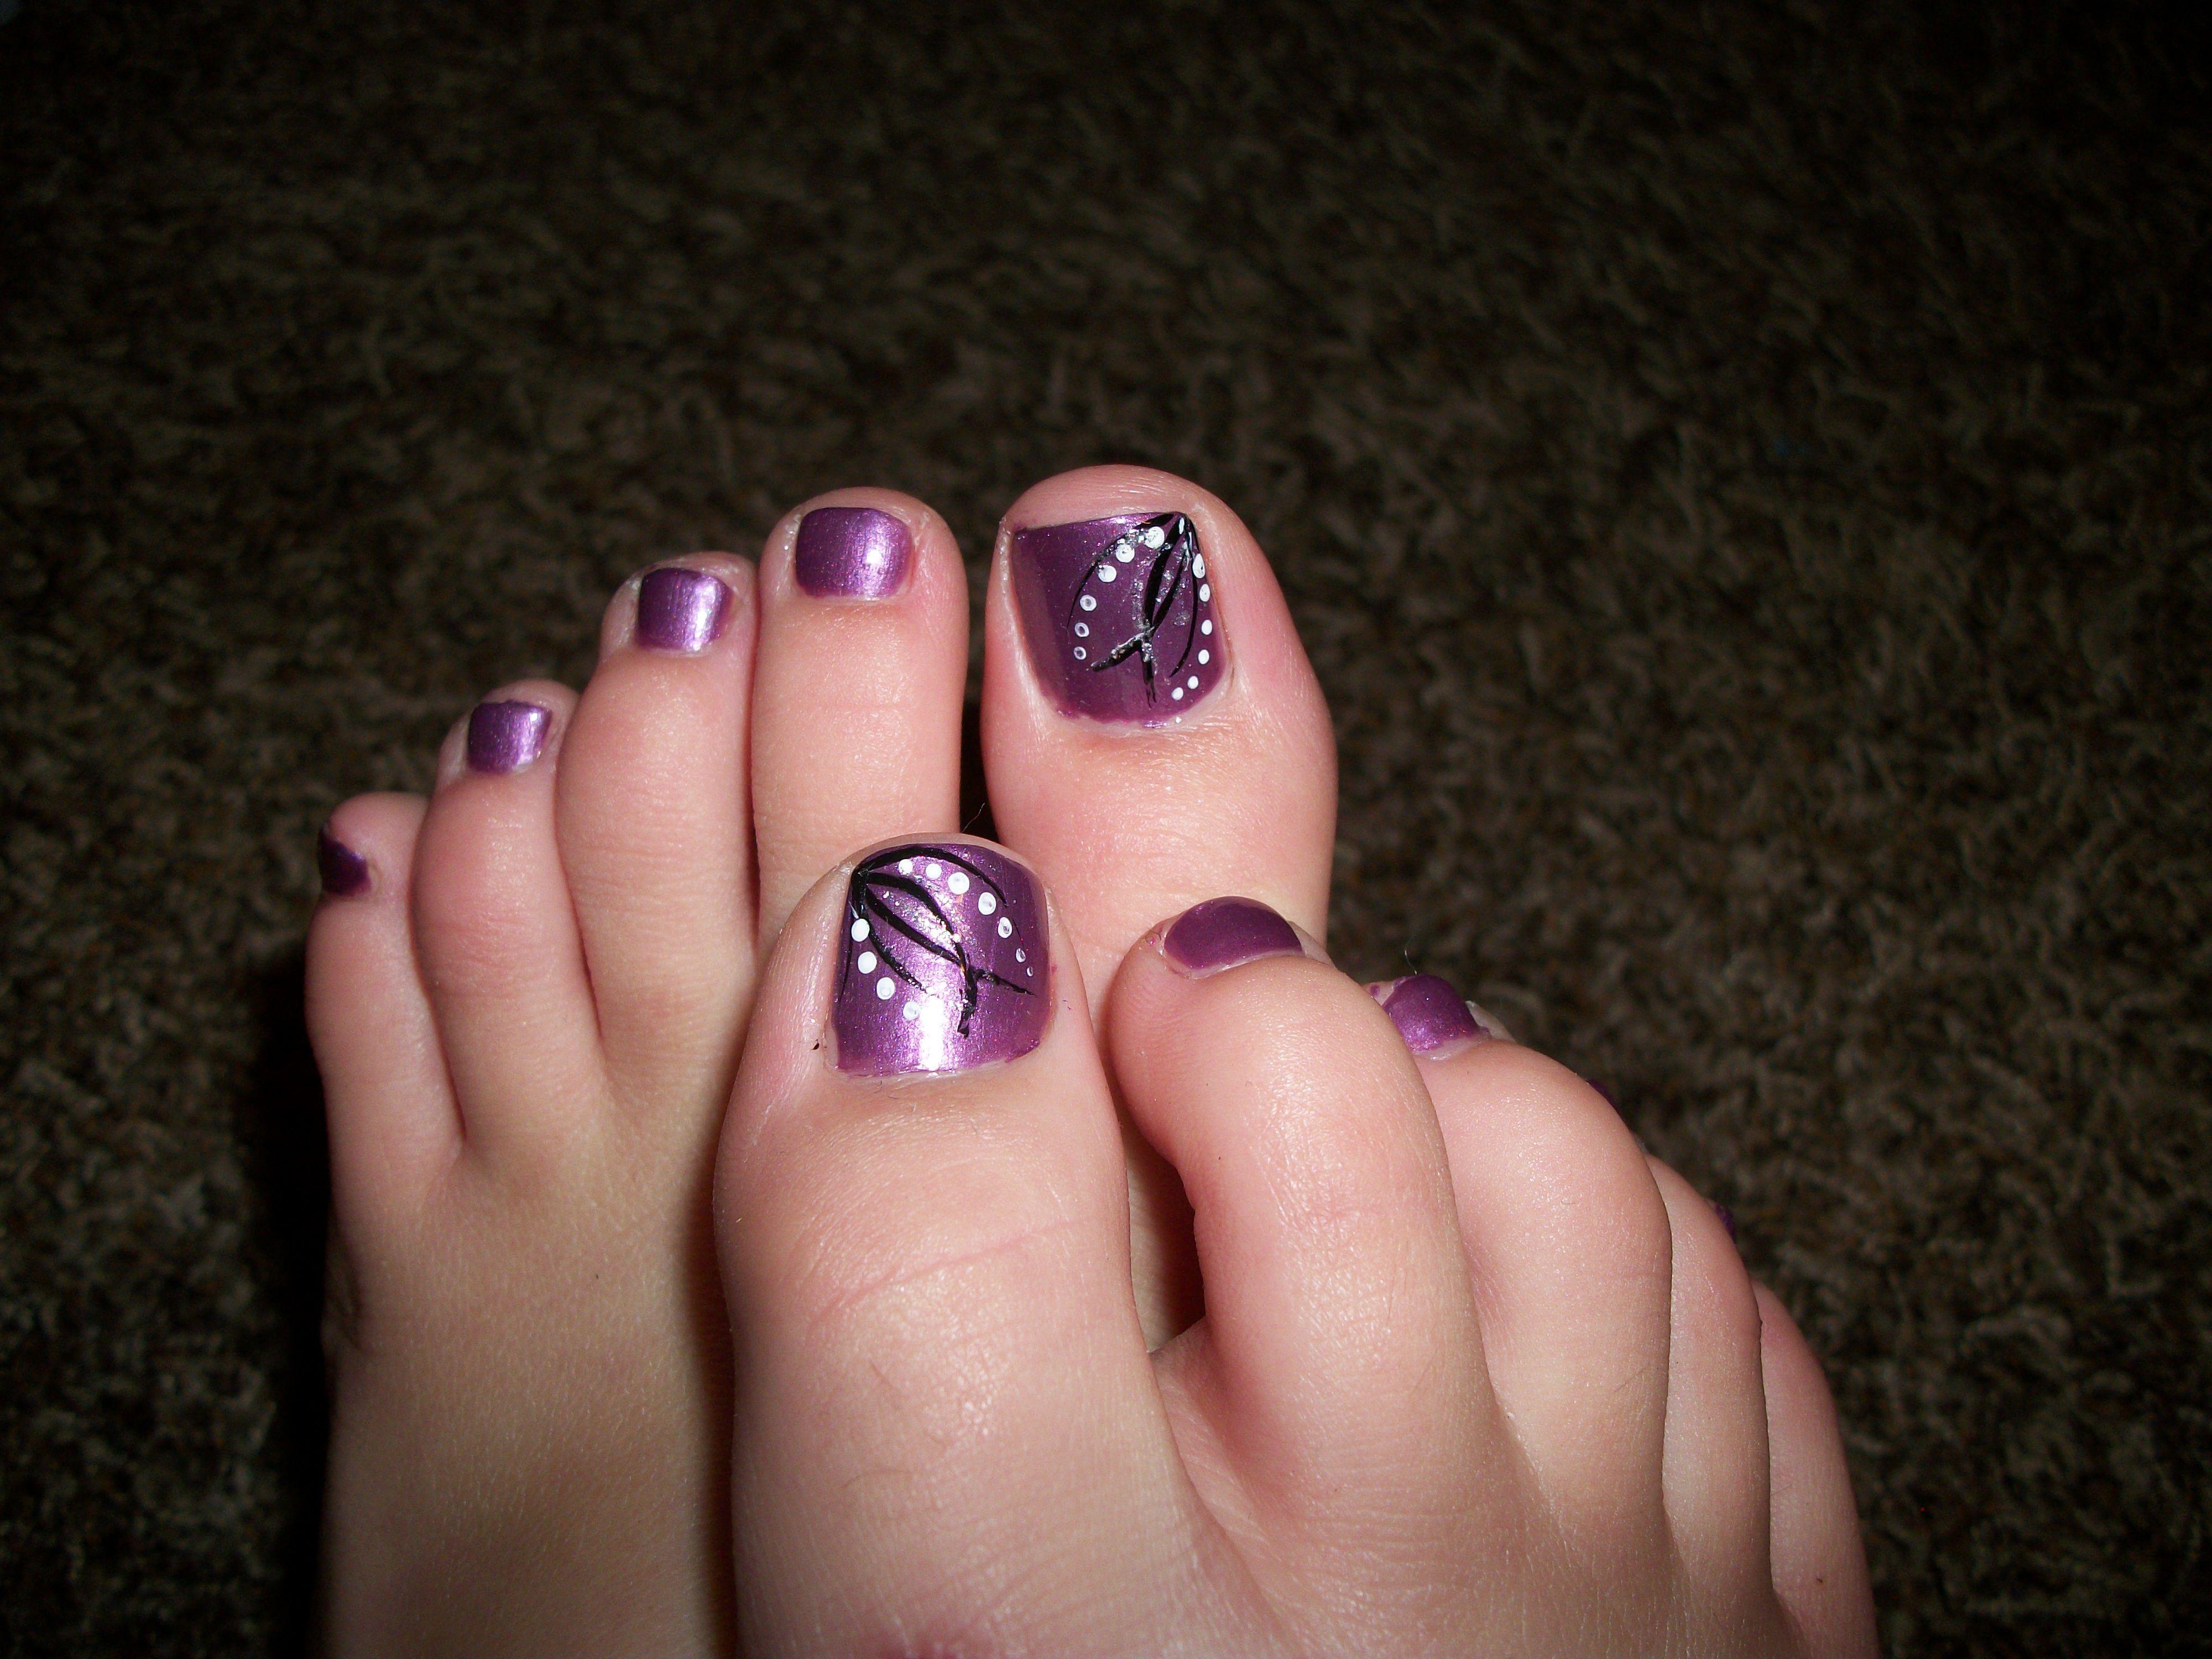 Purple Pedicure Pedicure Nail Designs Purple Pedicure Pedicure Nails